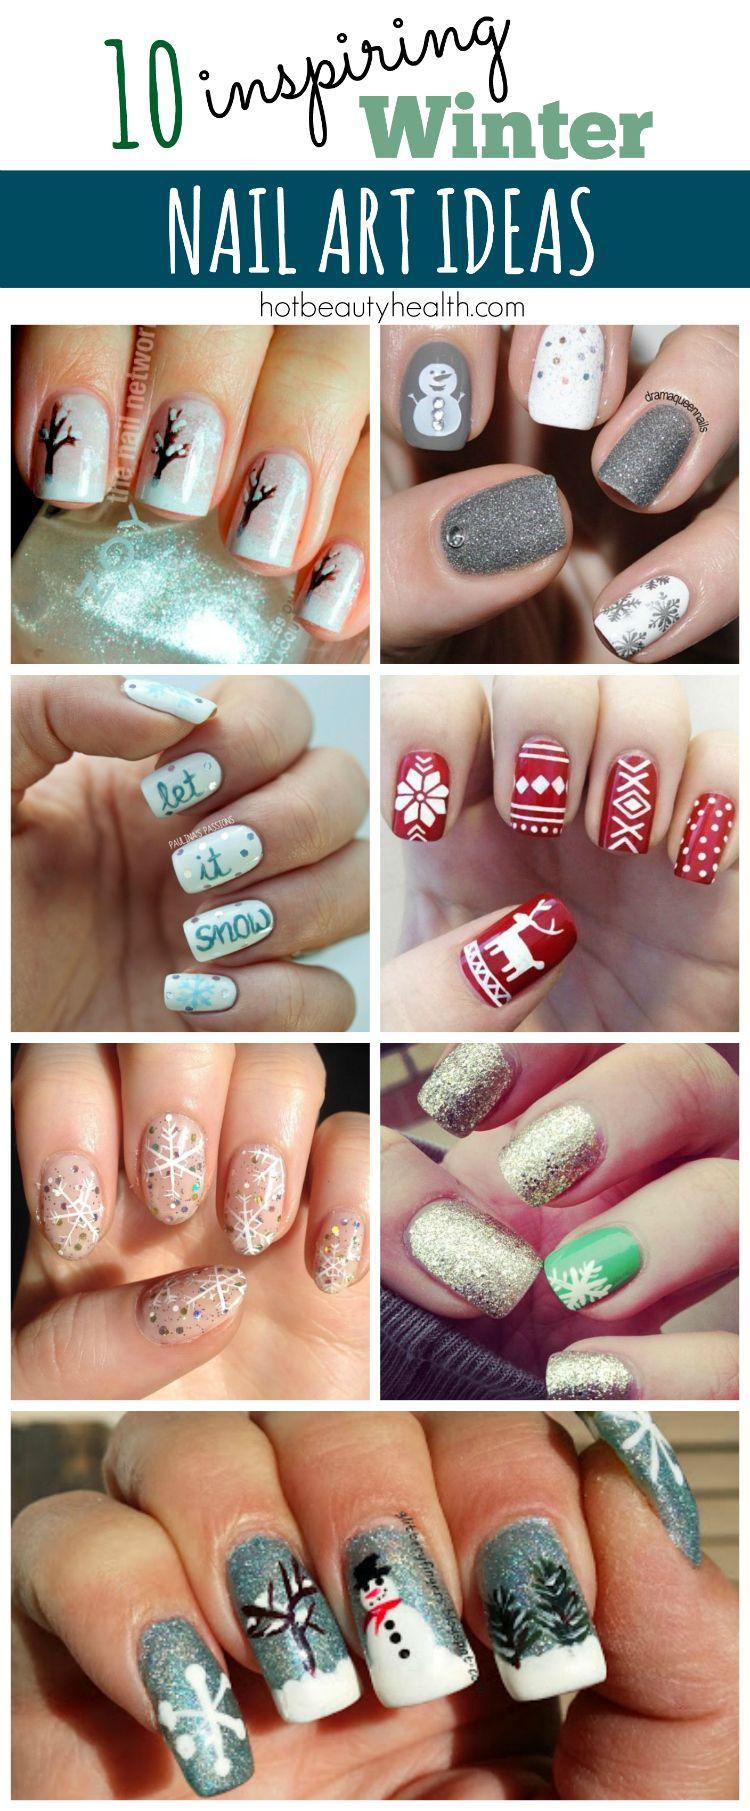 10 Lovely Nail Art Ideas to Brighten Up the Winter Season. | Winter ...